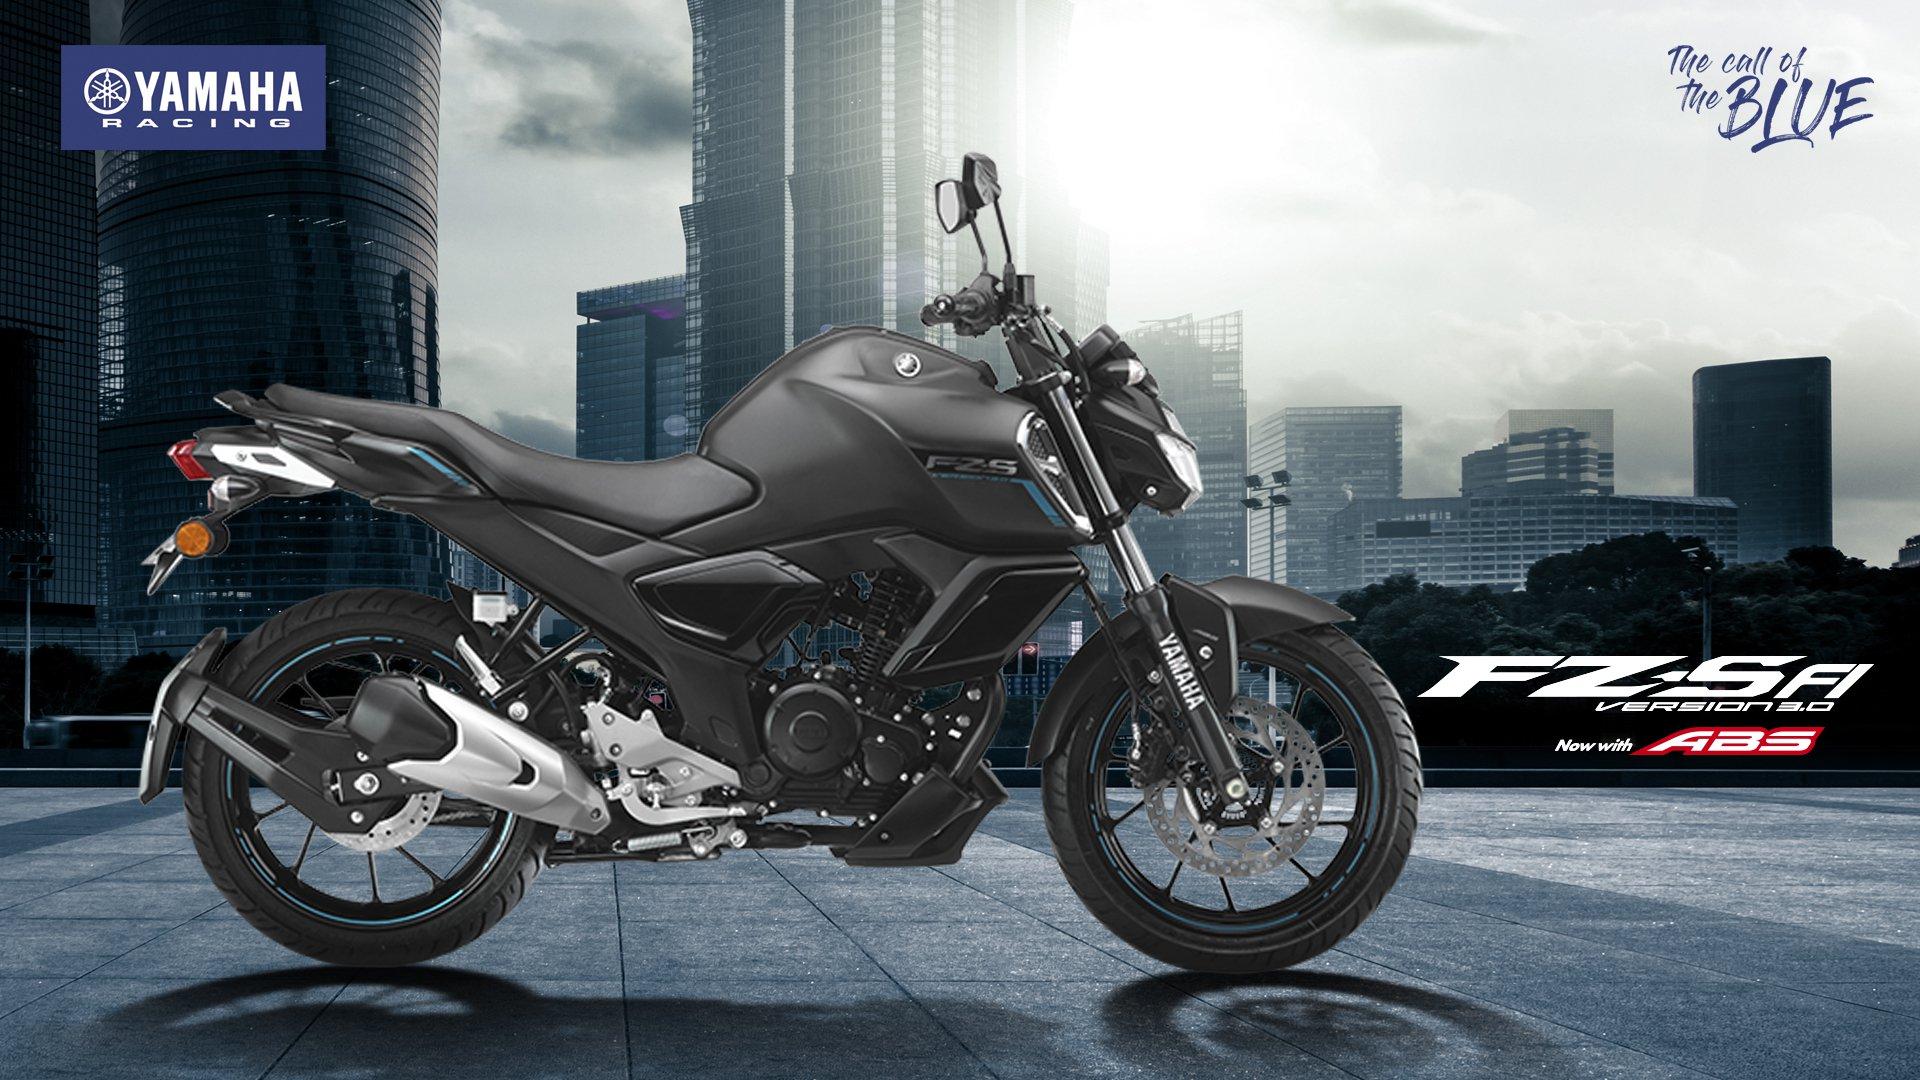 Yamaha FZS FI Price, Model, Mileage, Specs, Images | India